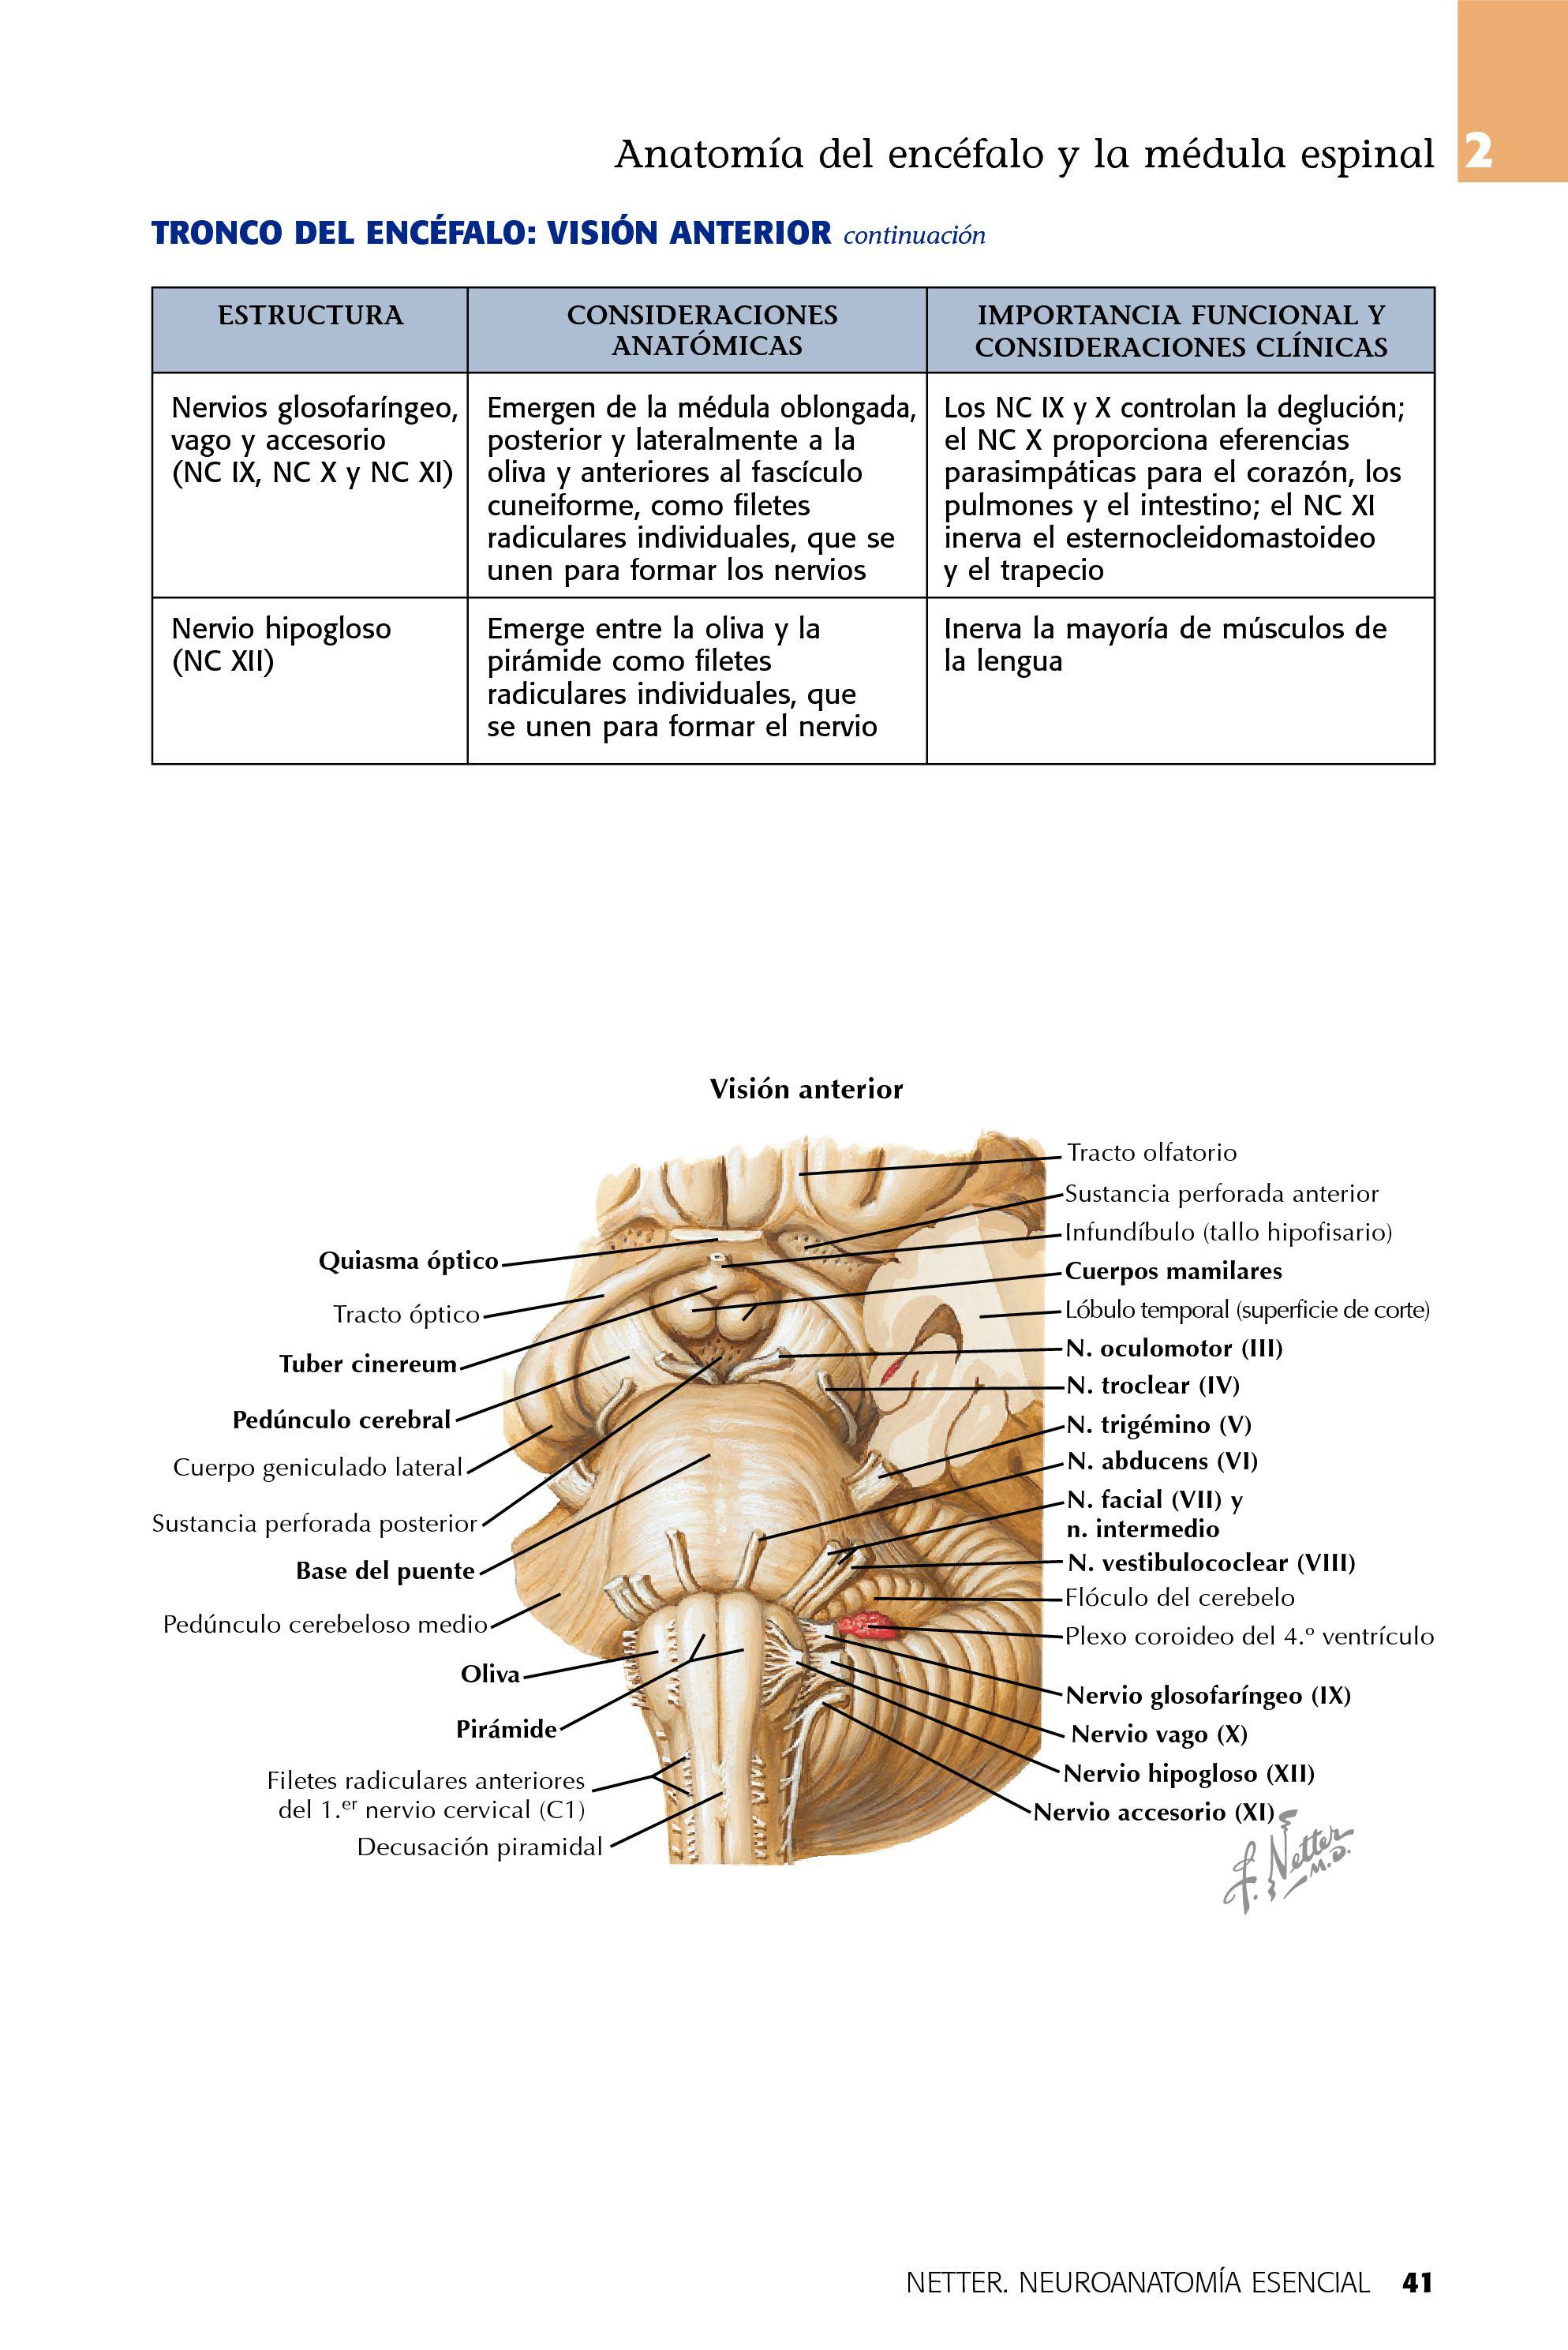 Netter Neuroanatomia Esencial 1° - CALAMEO Downloader